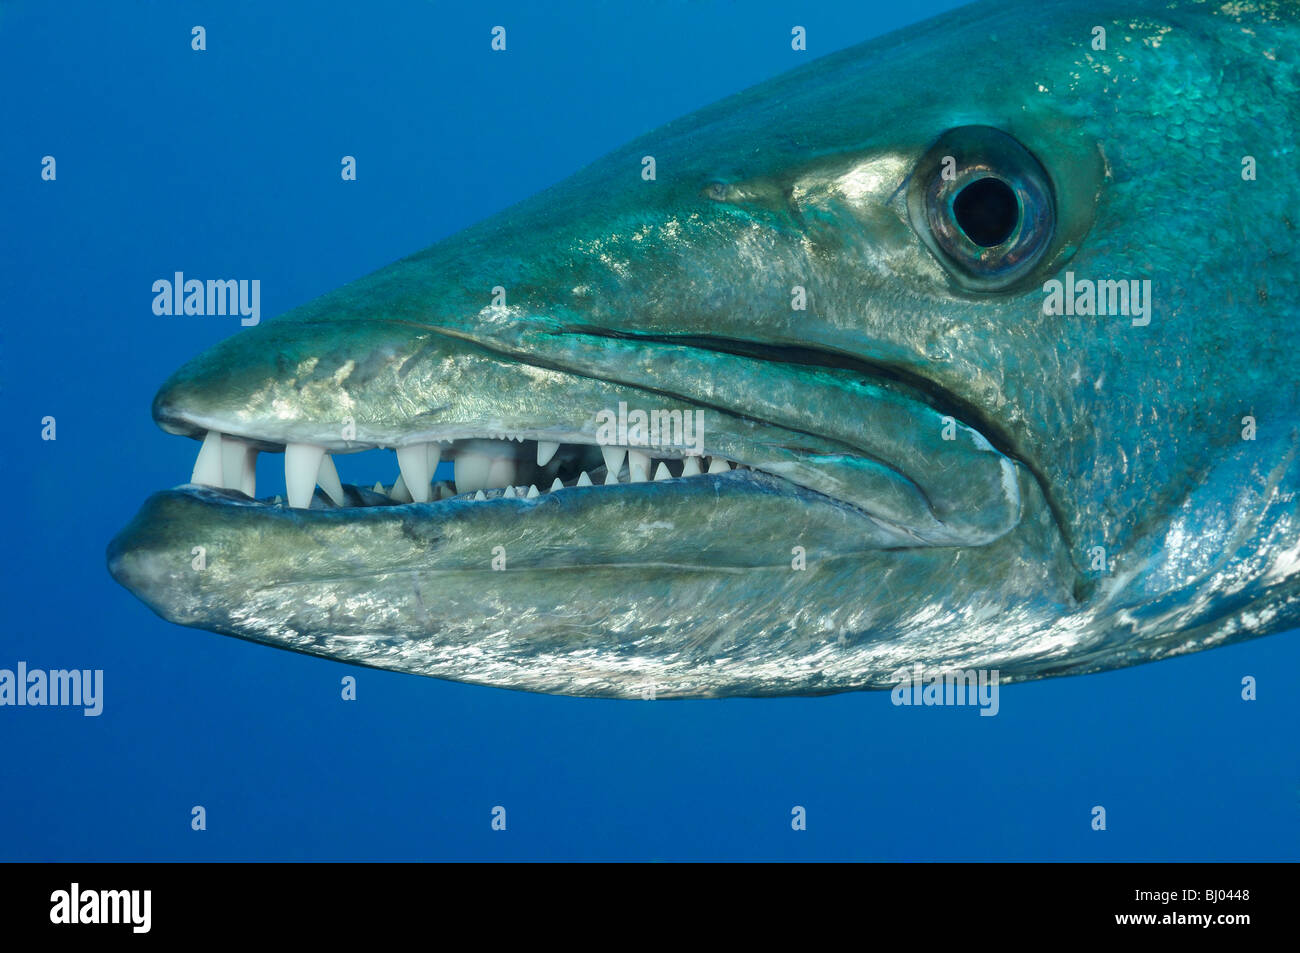 head of a Blackfin Barracuda, Tulamben, Liberty Wreck, Bali, Indonesia, Indopacific Ocean - Stock Image